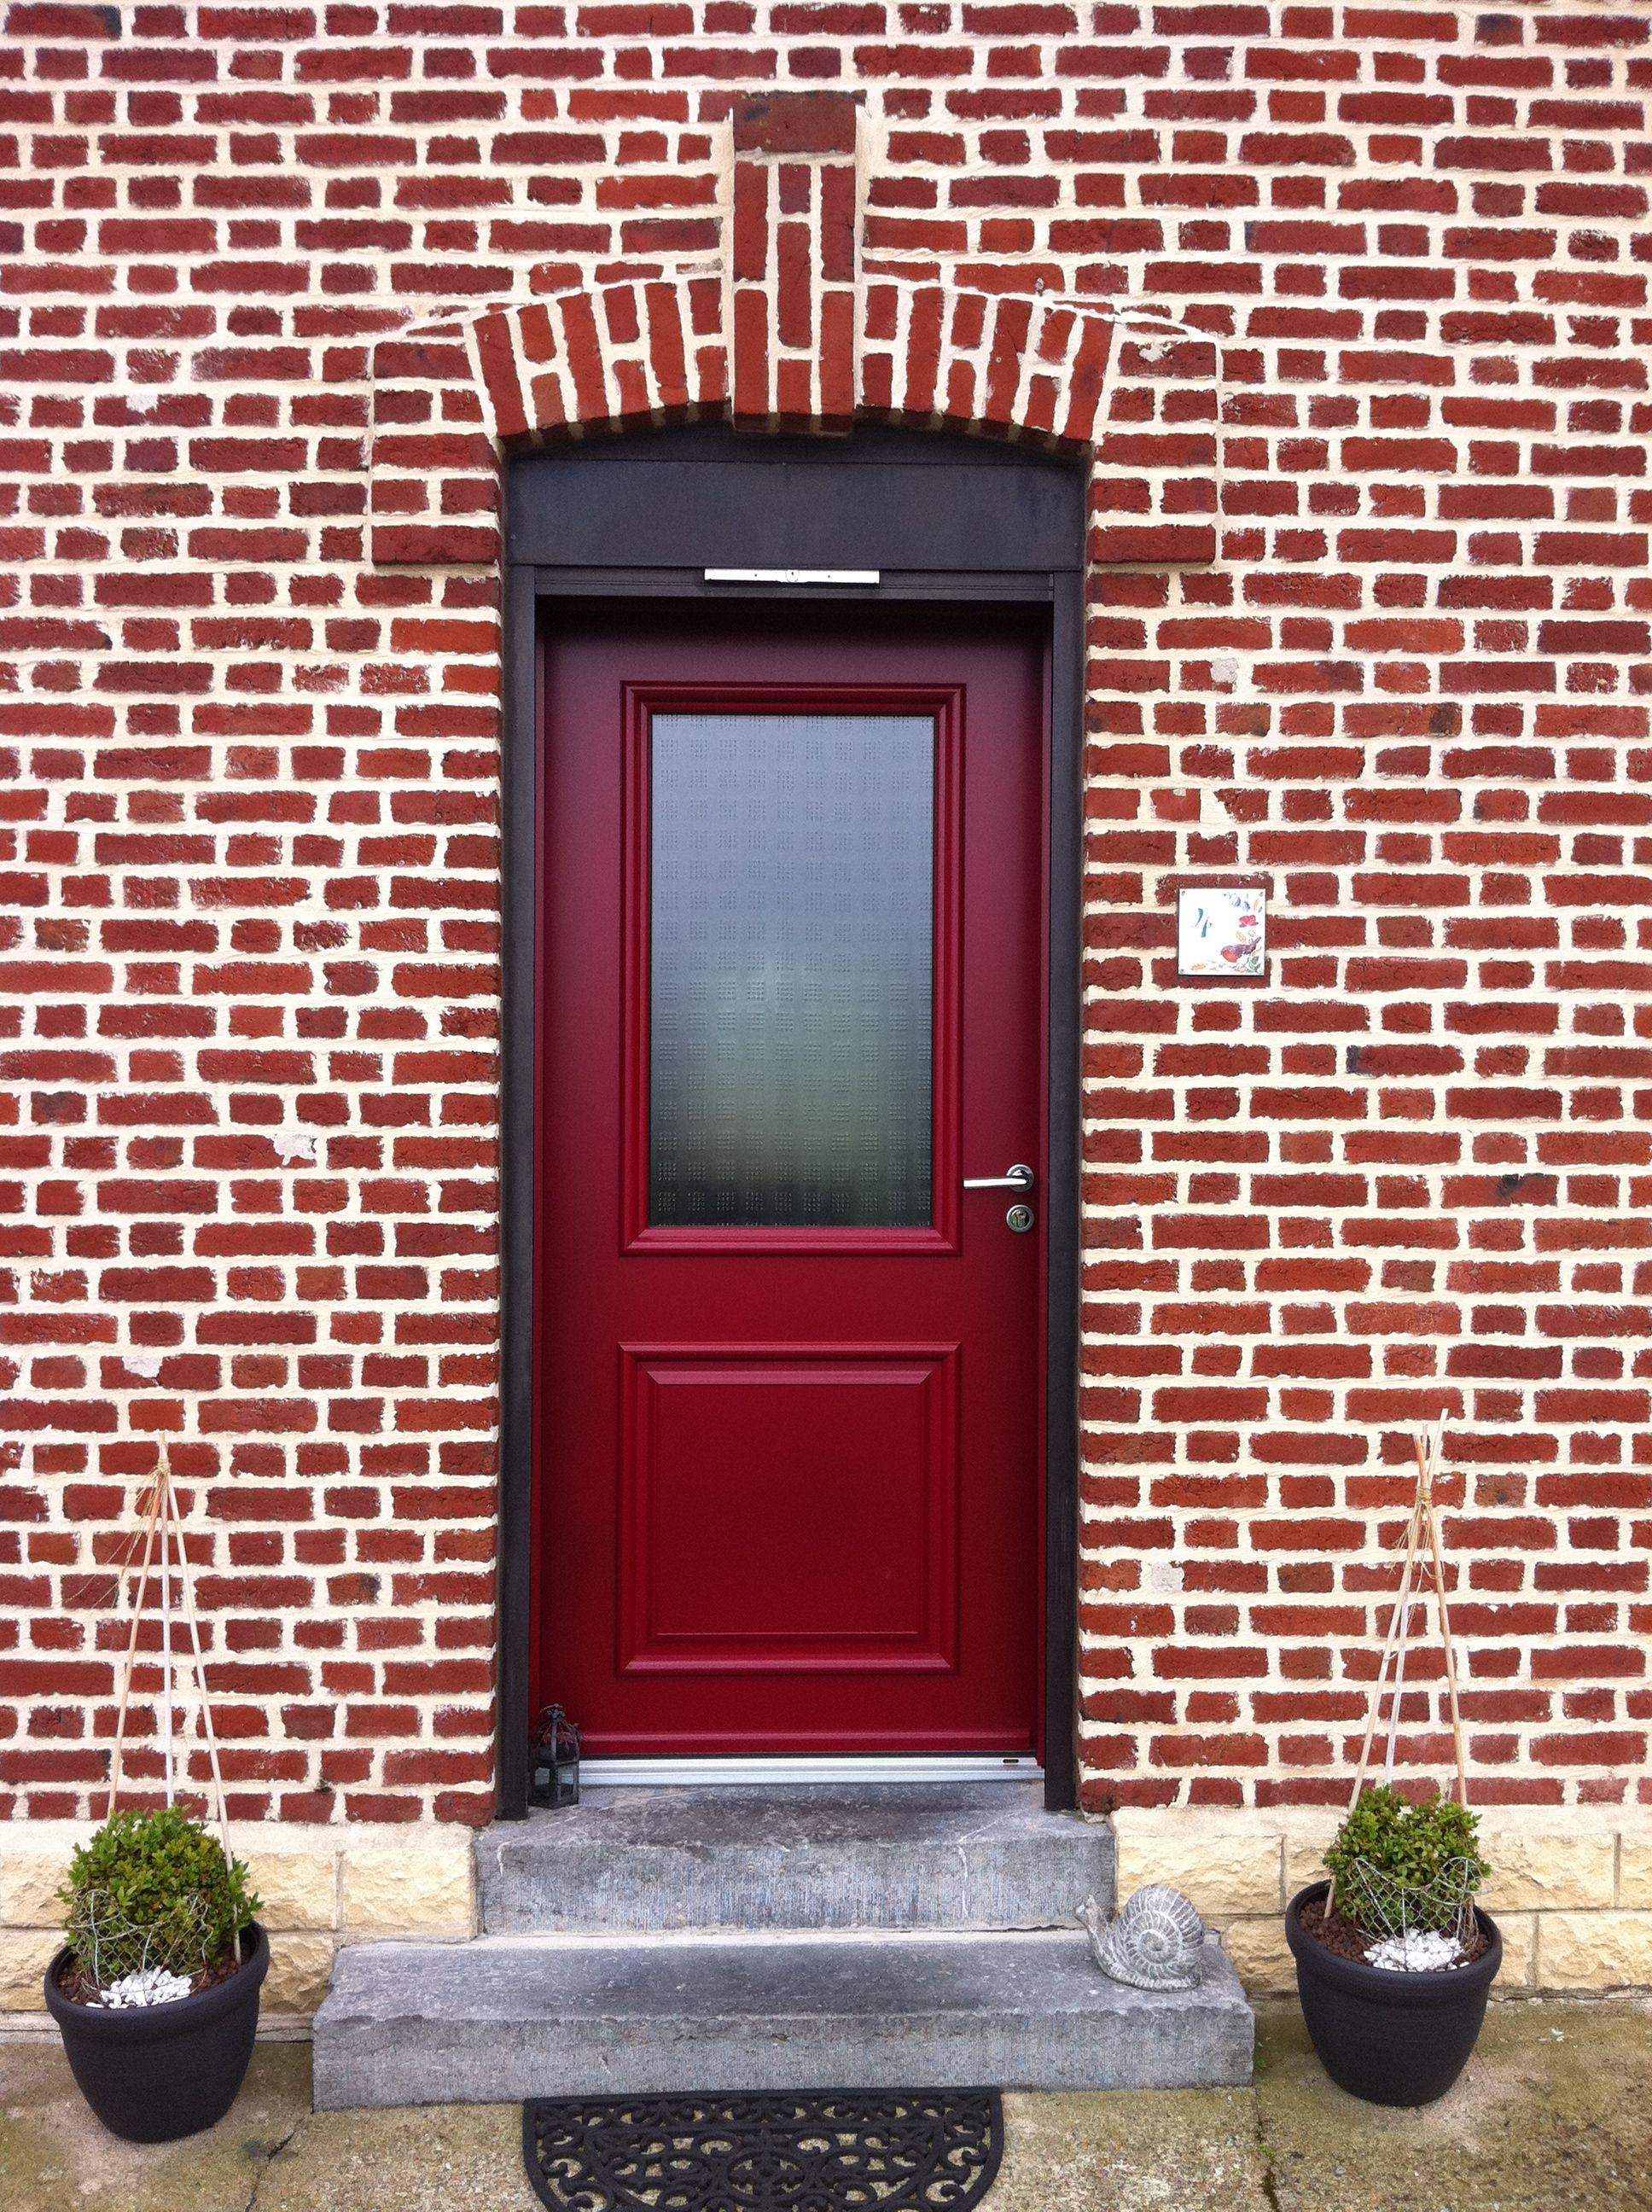 porte d 39 entr e vitr e rouge en aluminium gamme min rale. Black Bedroom Furniture Sets. Home Design Ideas